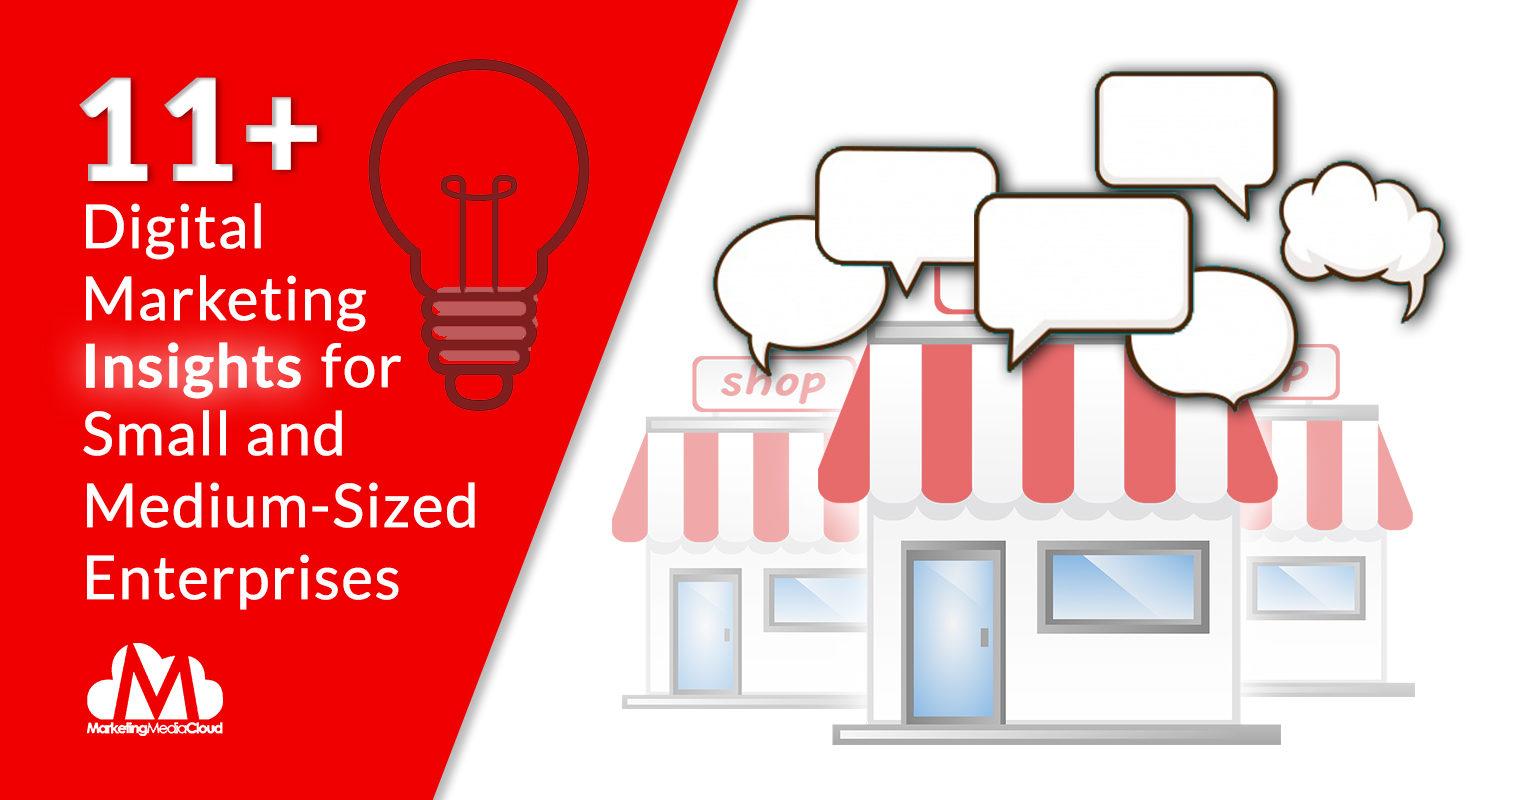 11+ Digital Marketing Insights for Small and Medium-Sized Enterprises